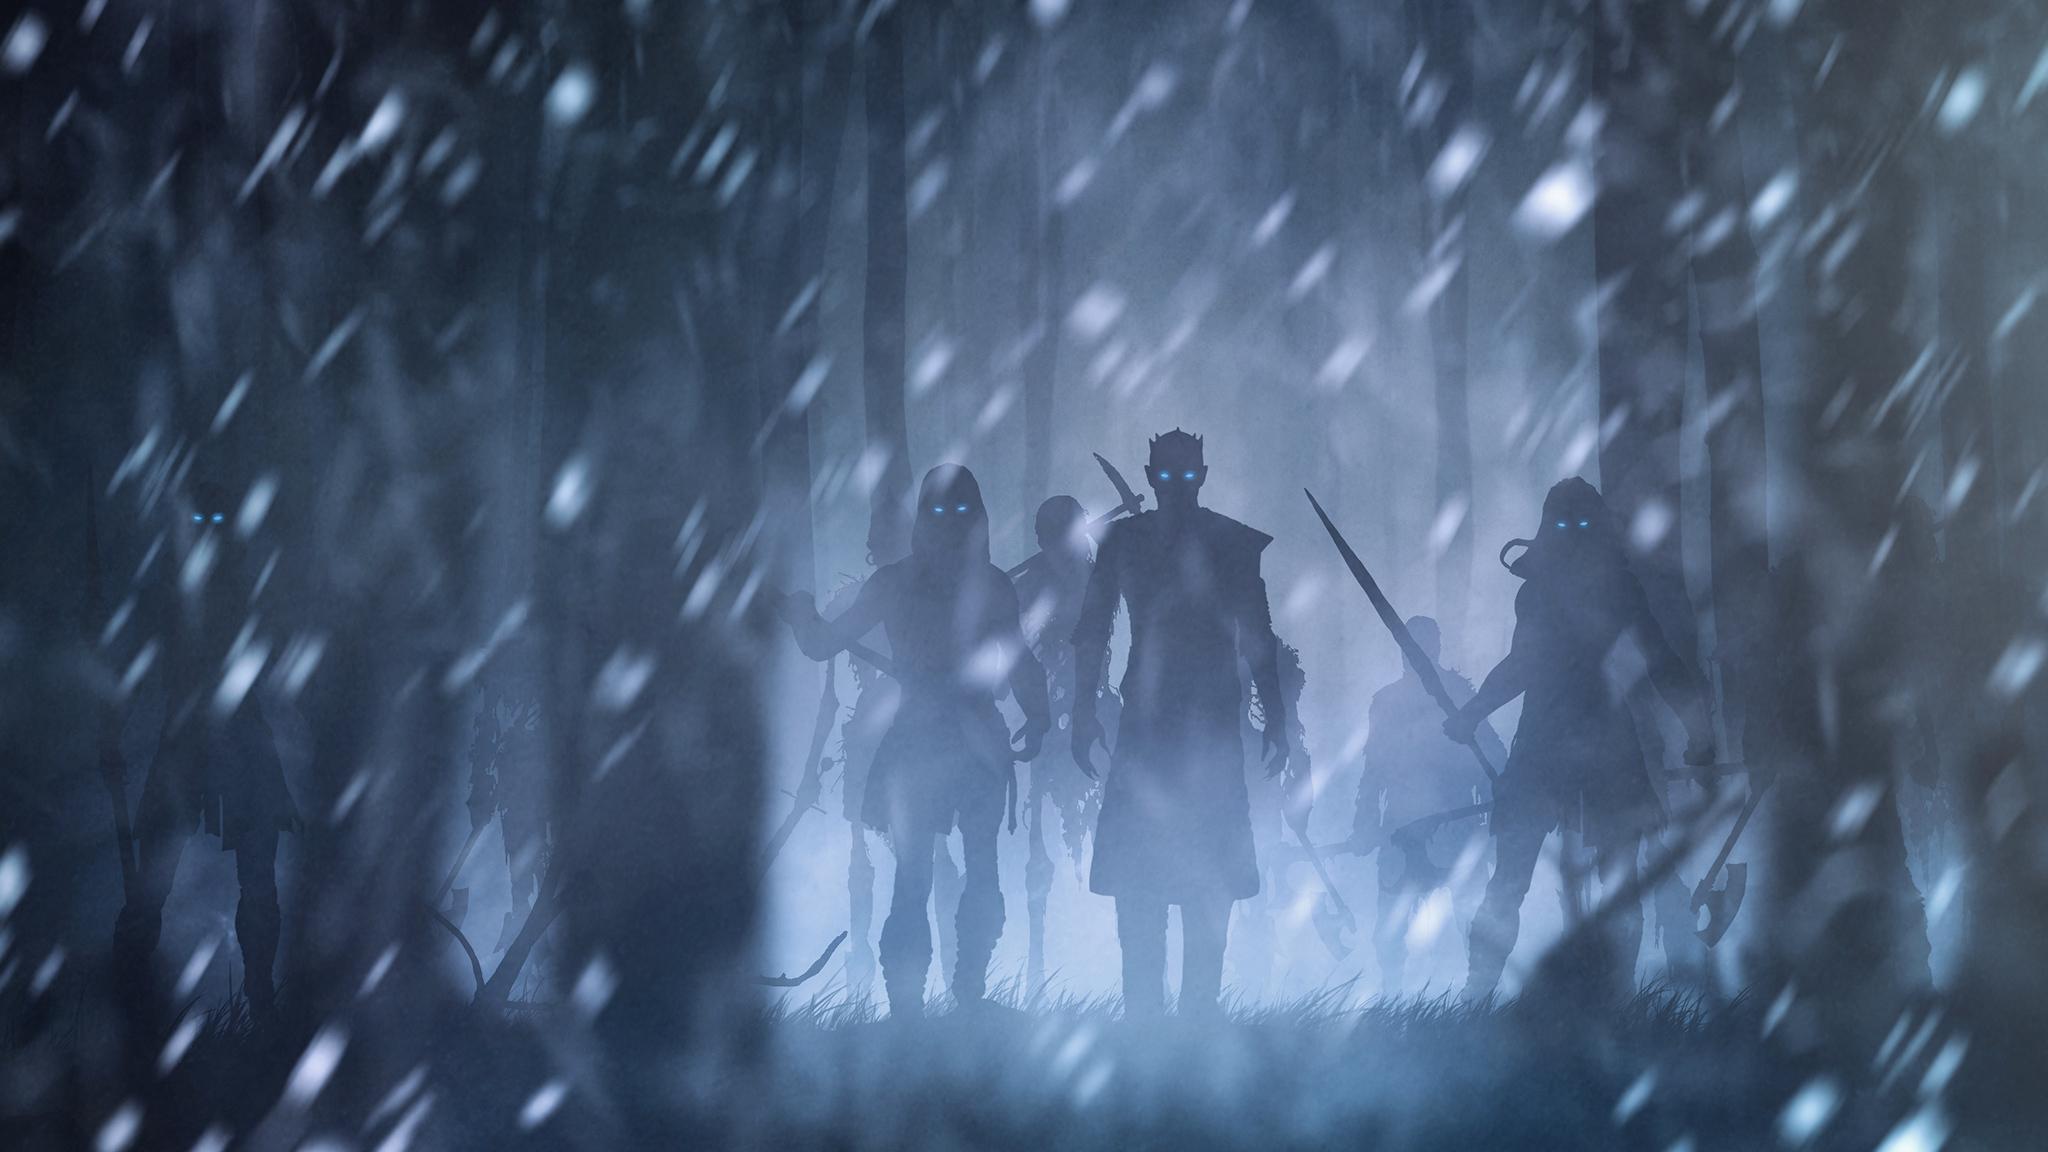 night-king-with-white-walkers-artwork-sh.jpg